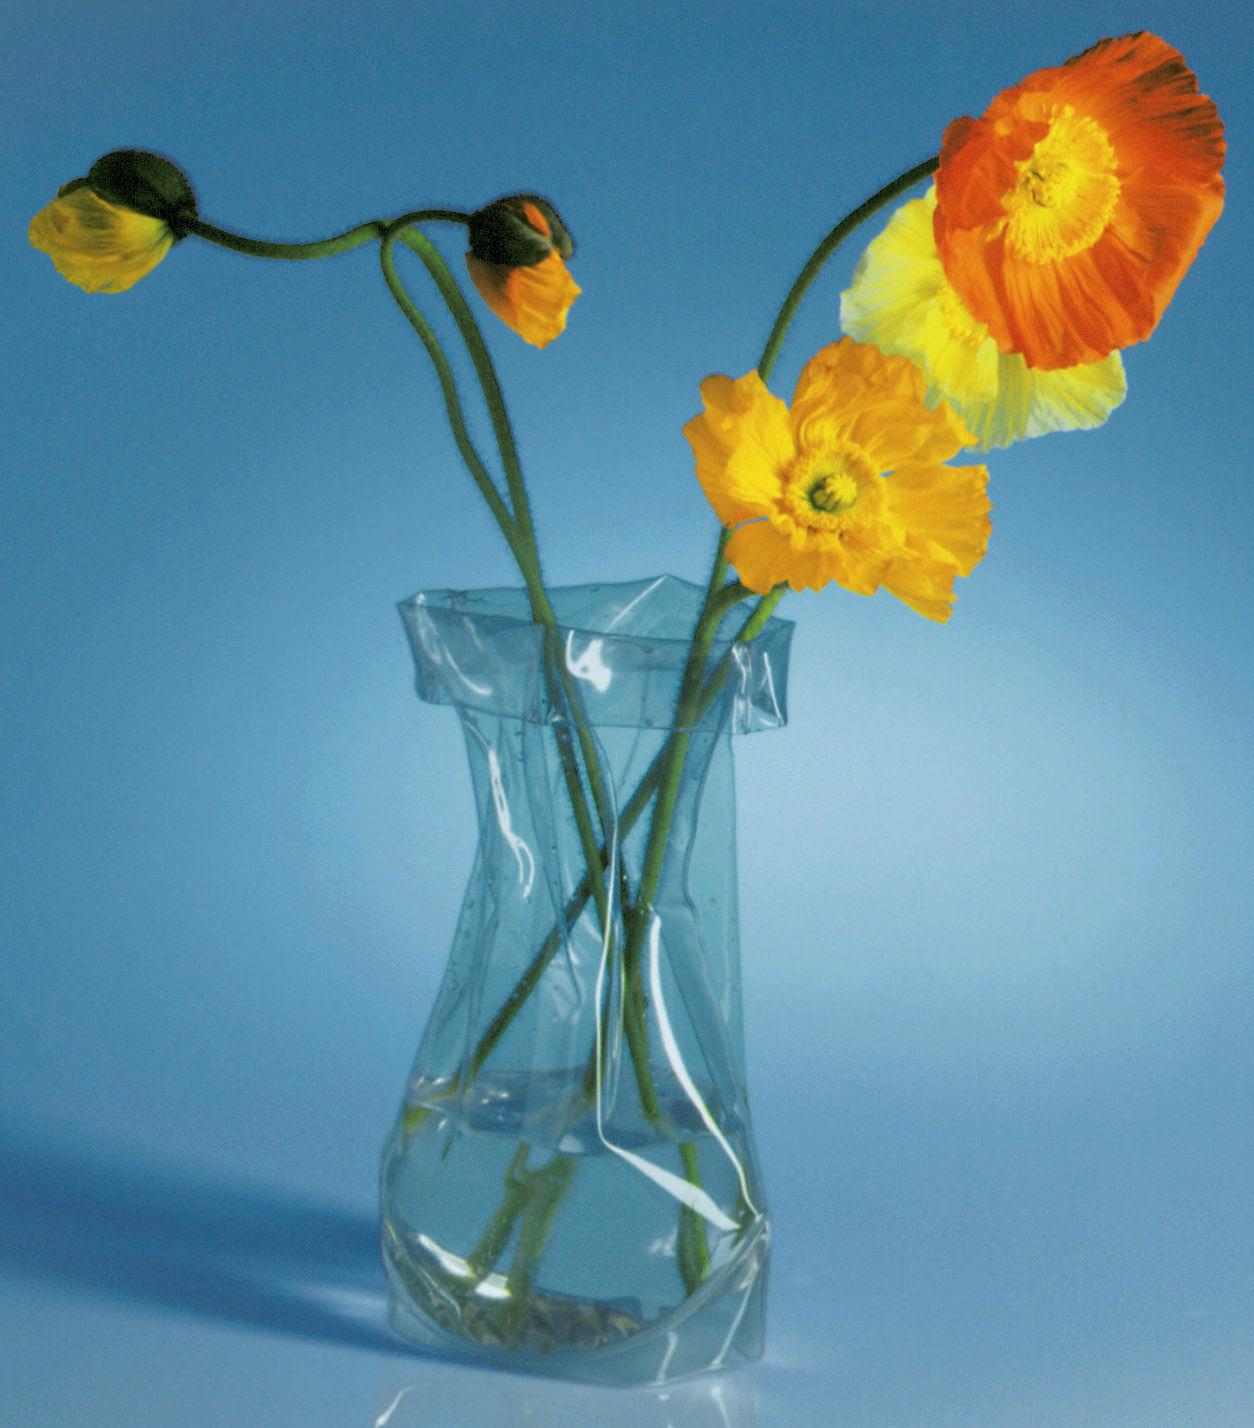 Interni - Vasi - Vaso Le Sack - Modulabile di Pa Design - Trasparente - PVC